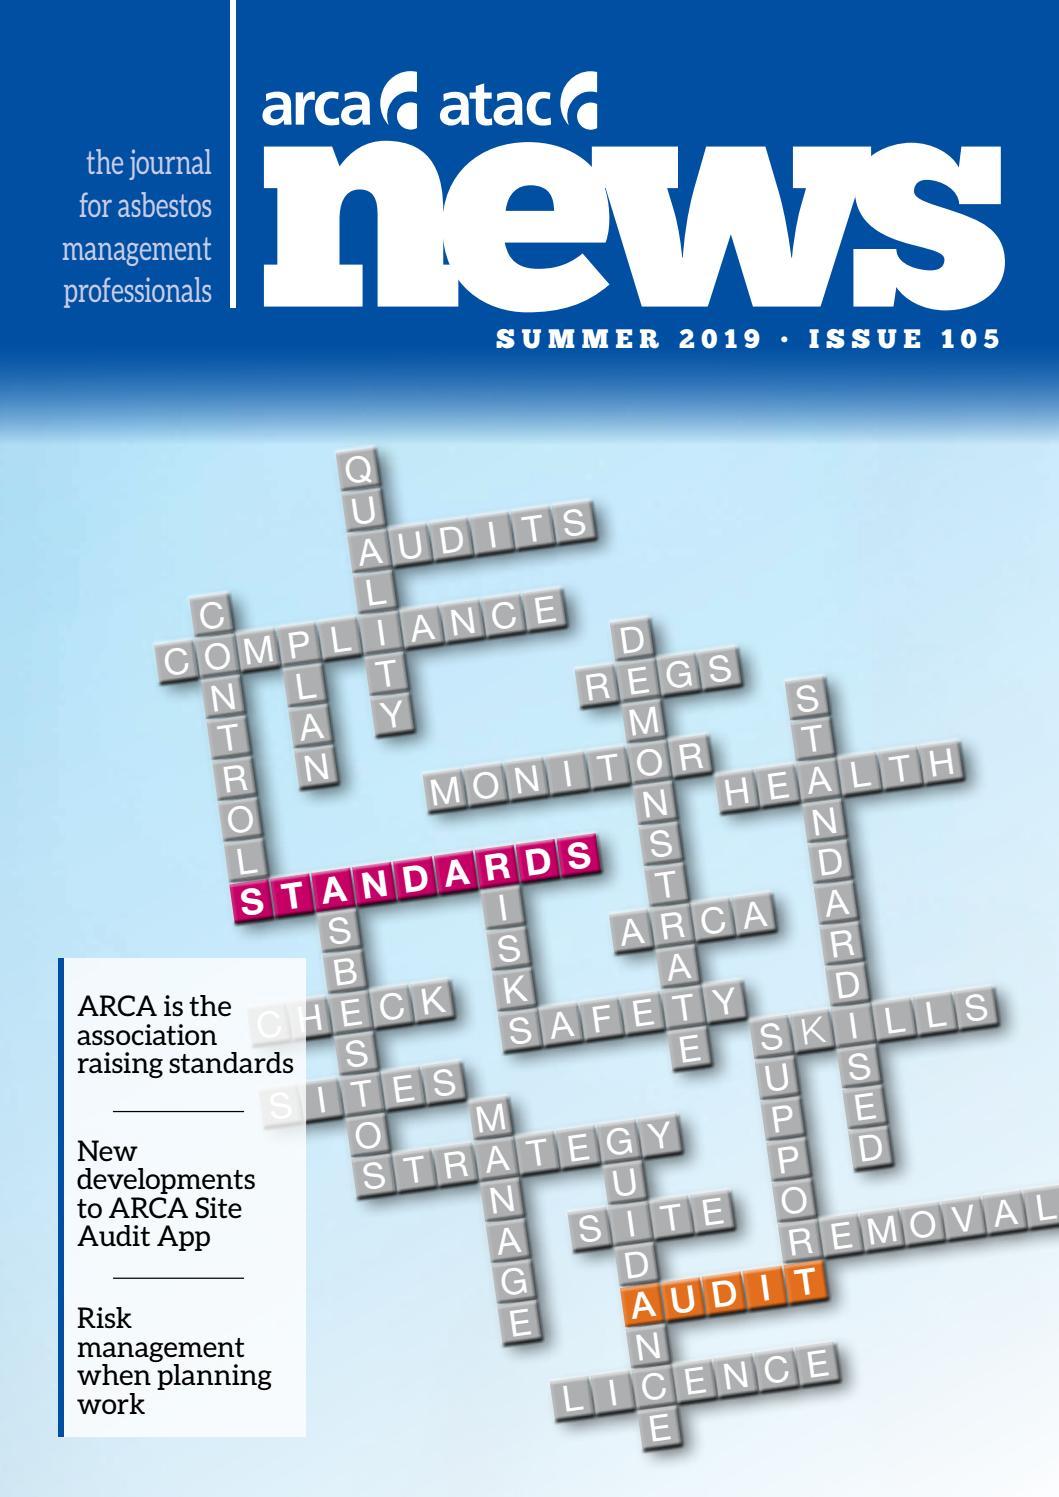 ARCA News Issue 105 Summer 2019 by Steve Sadley - issuu